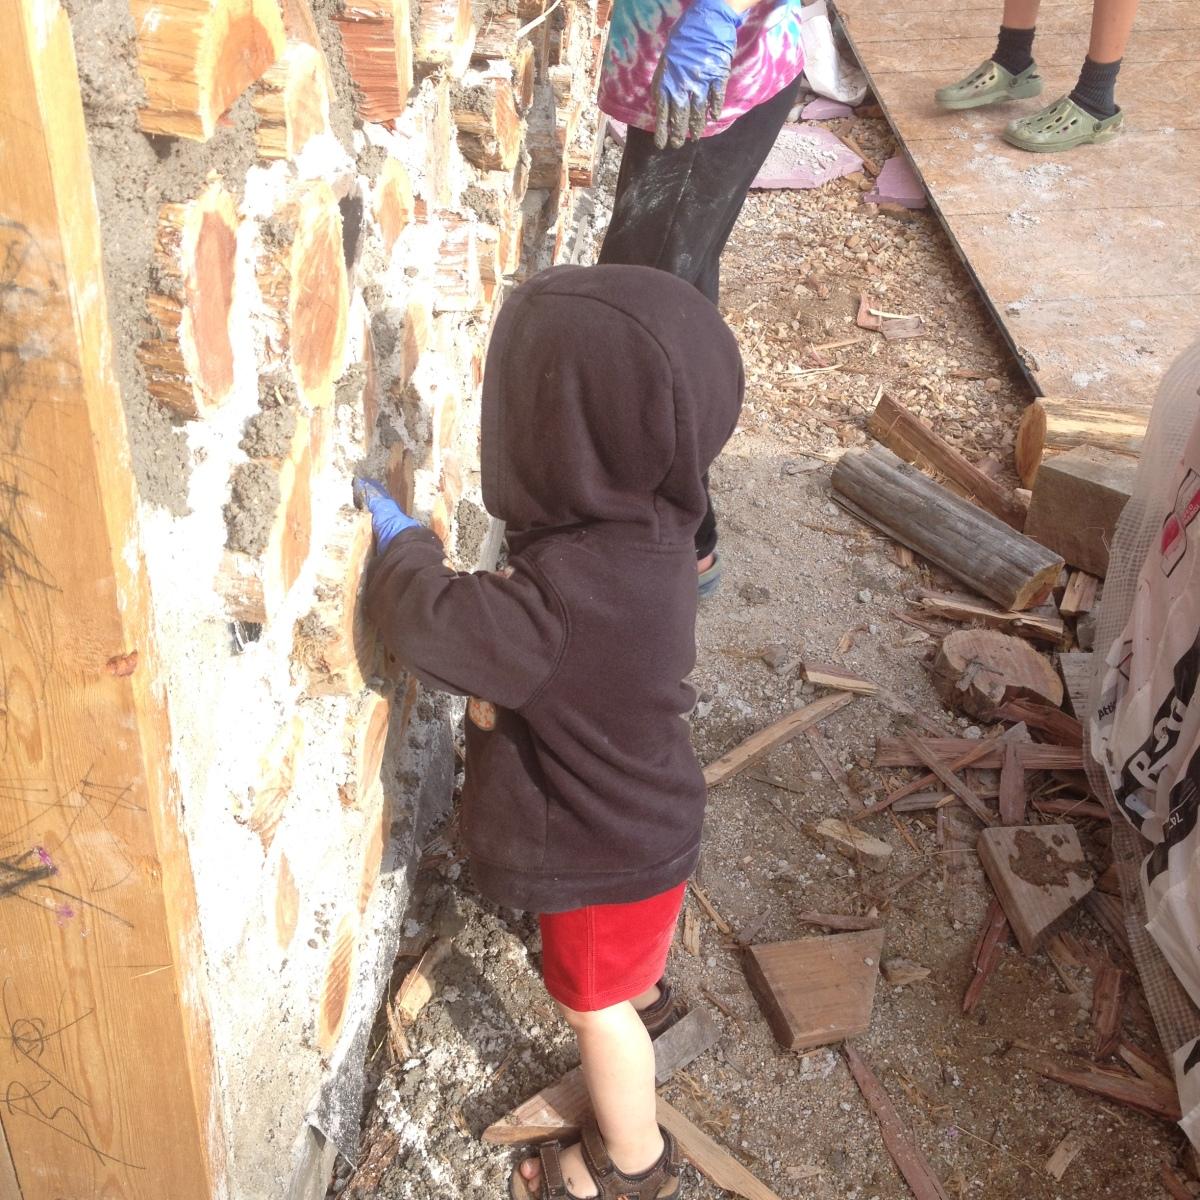 Helping with cordwood